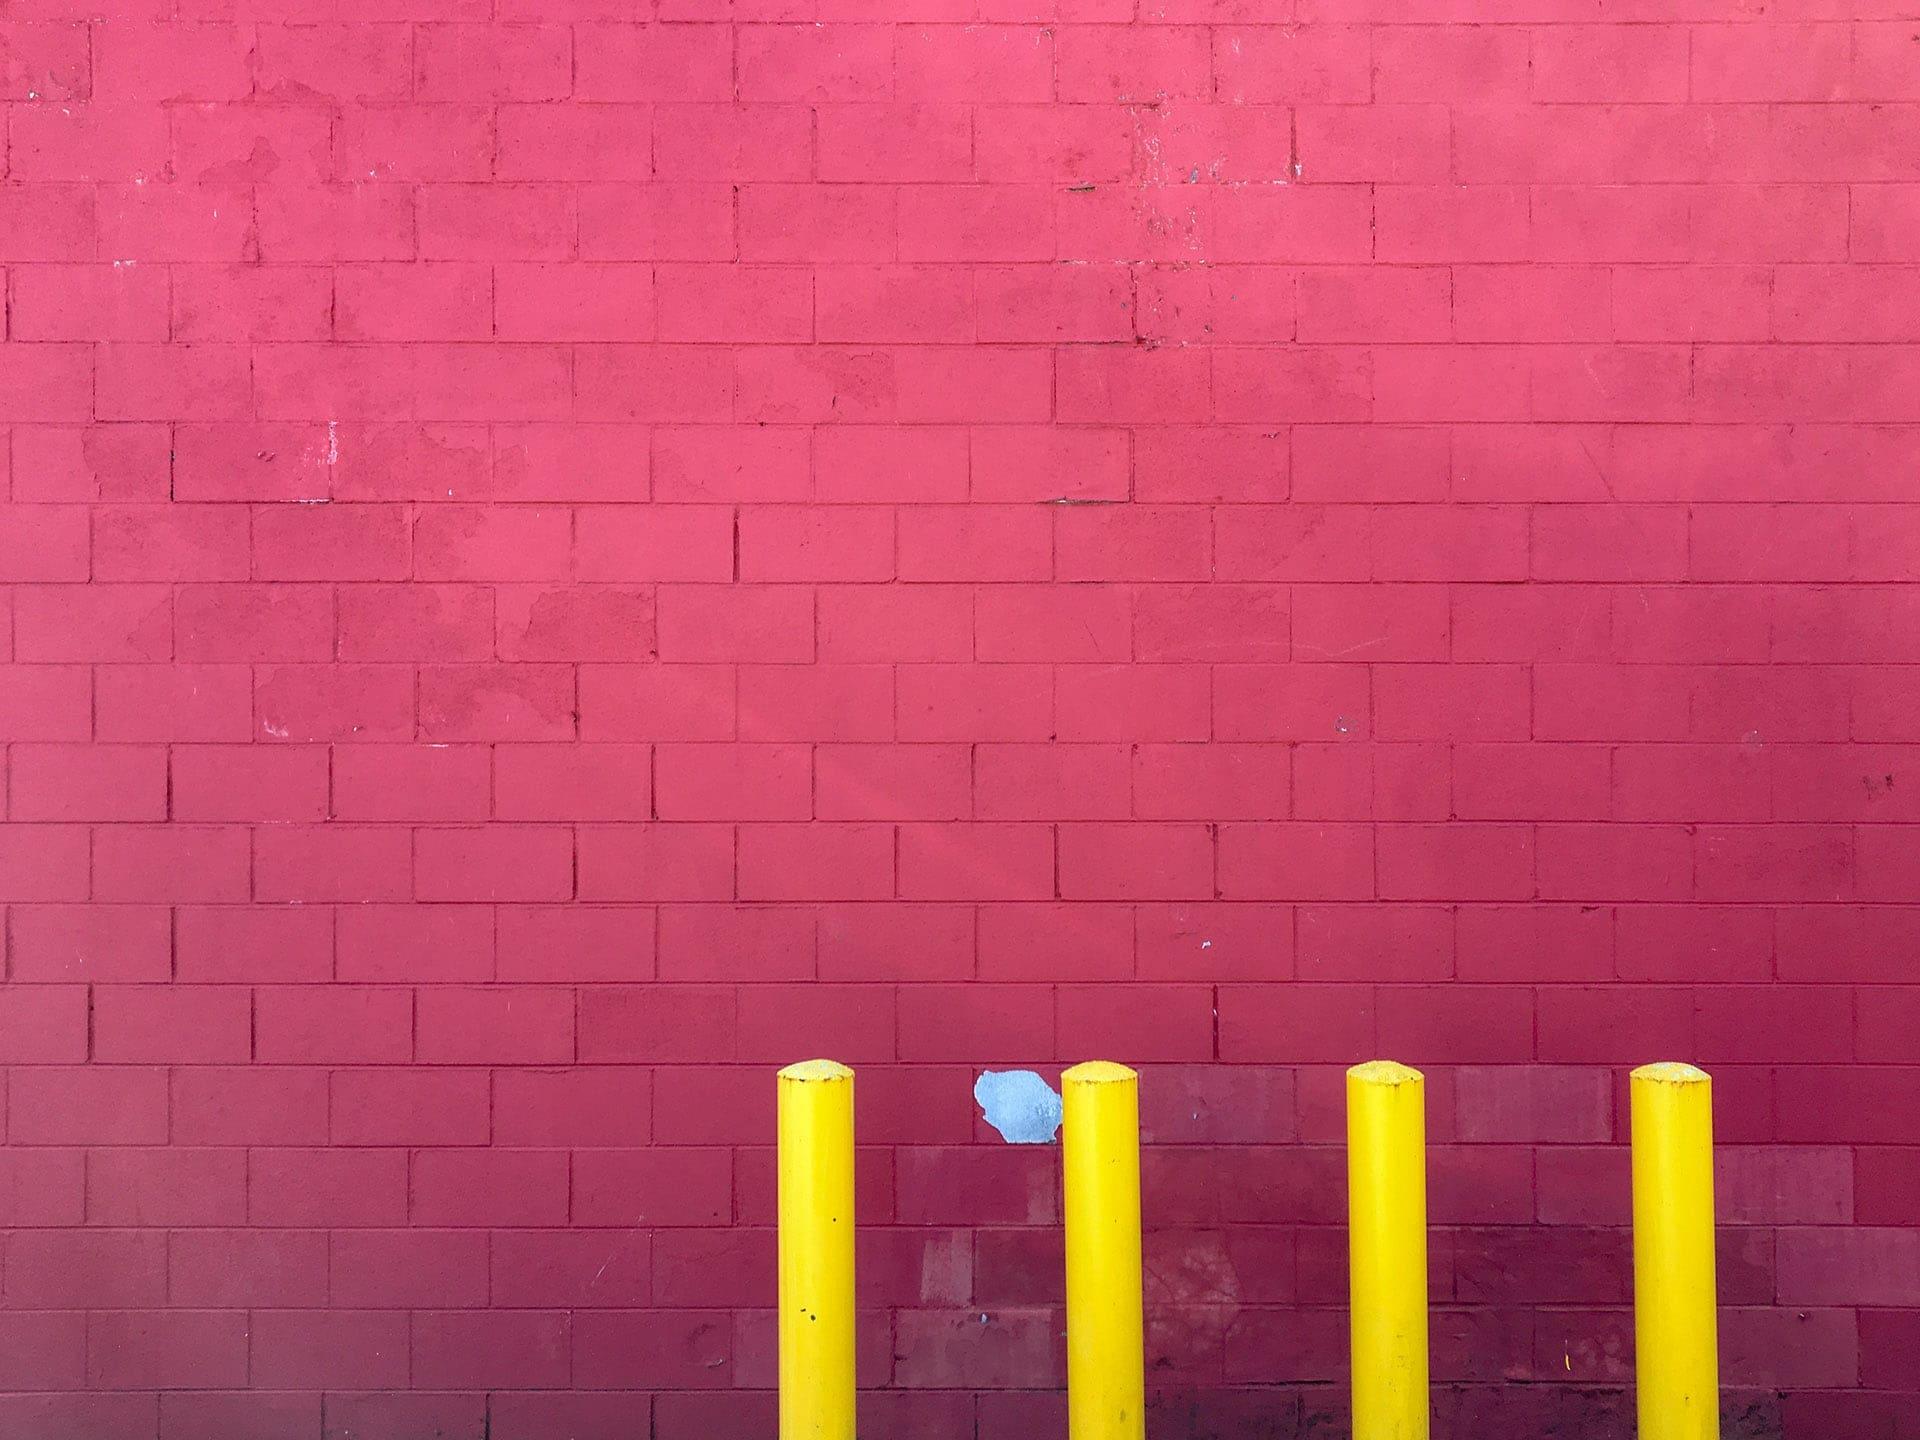 artnorama - Wall four Pillars